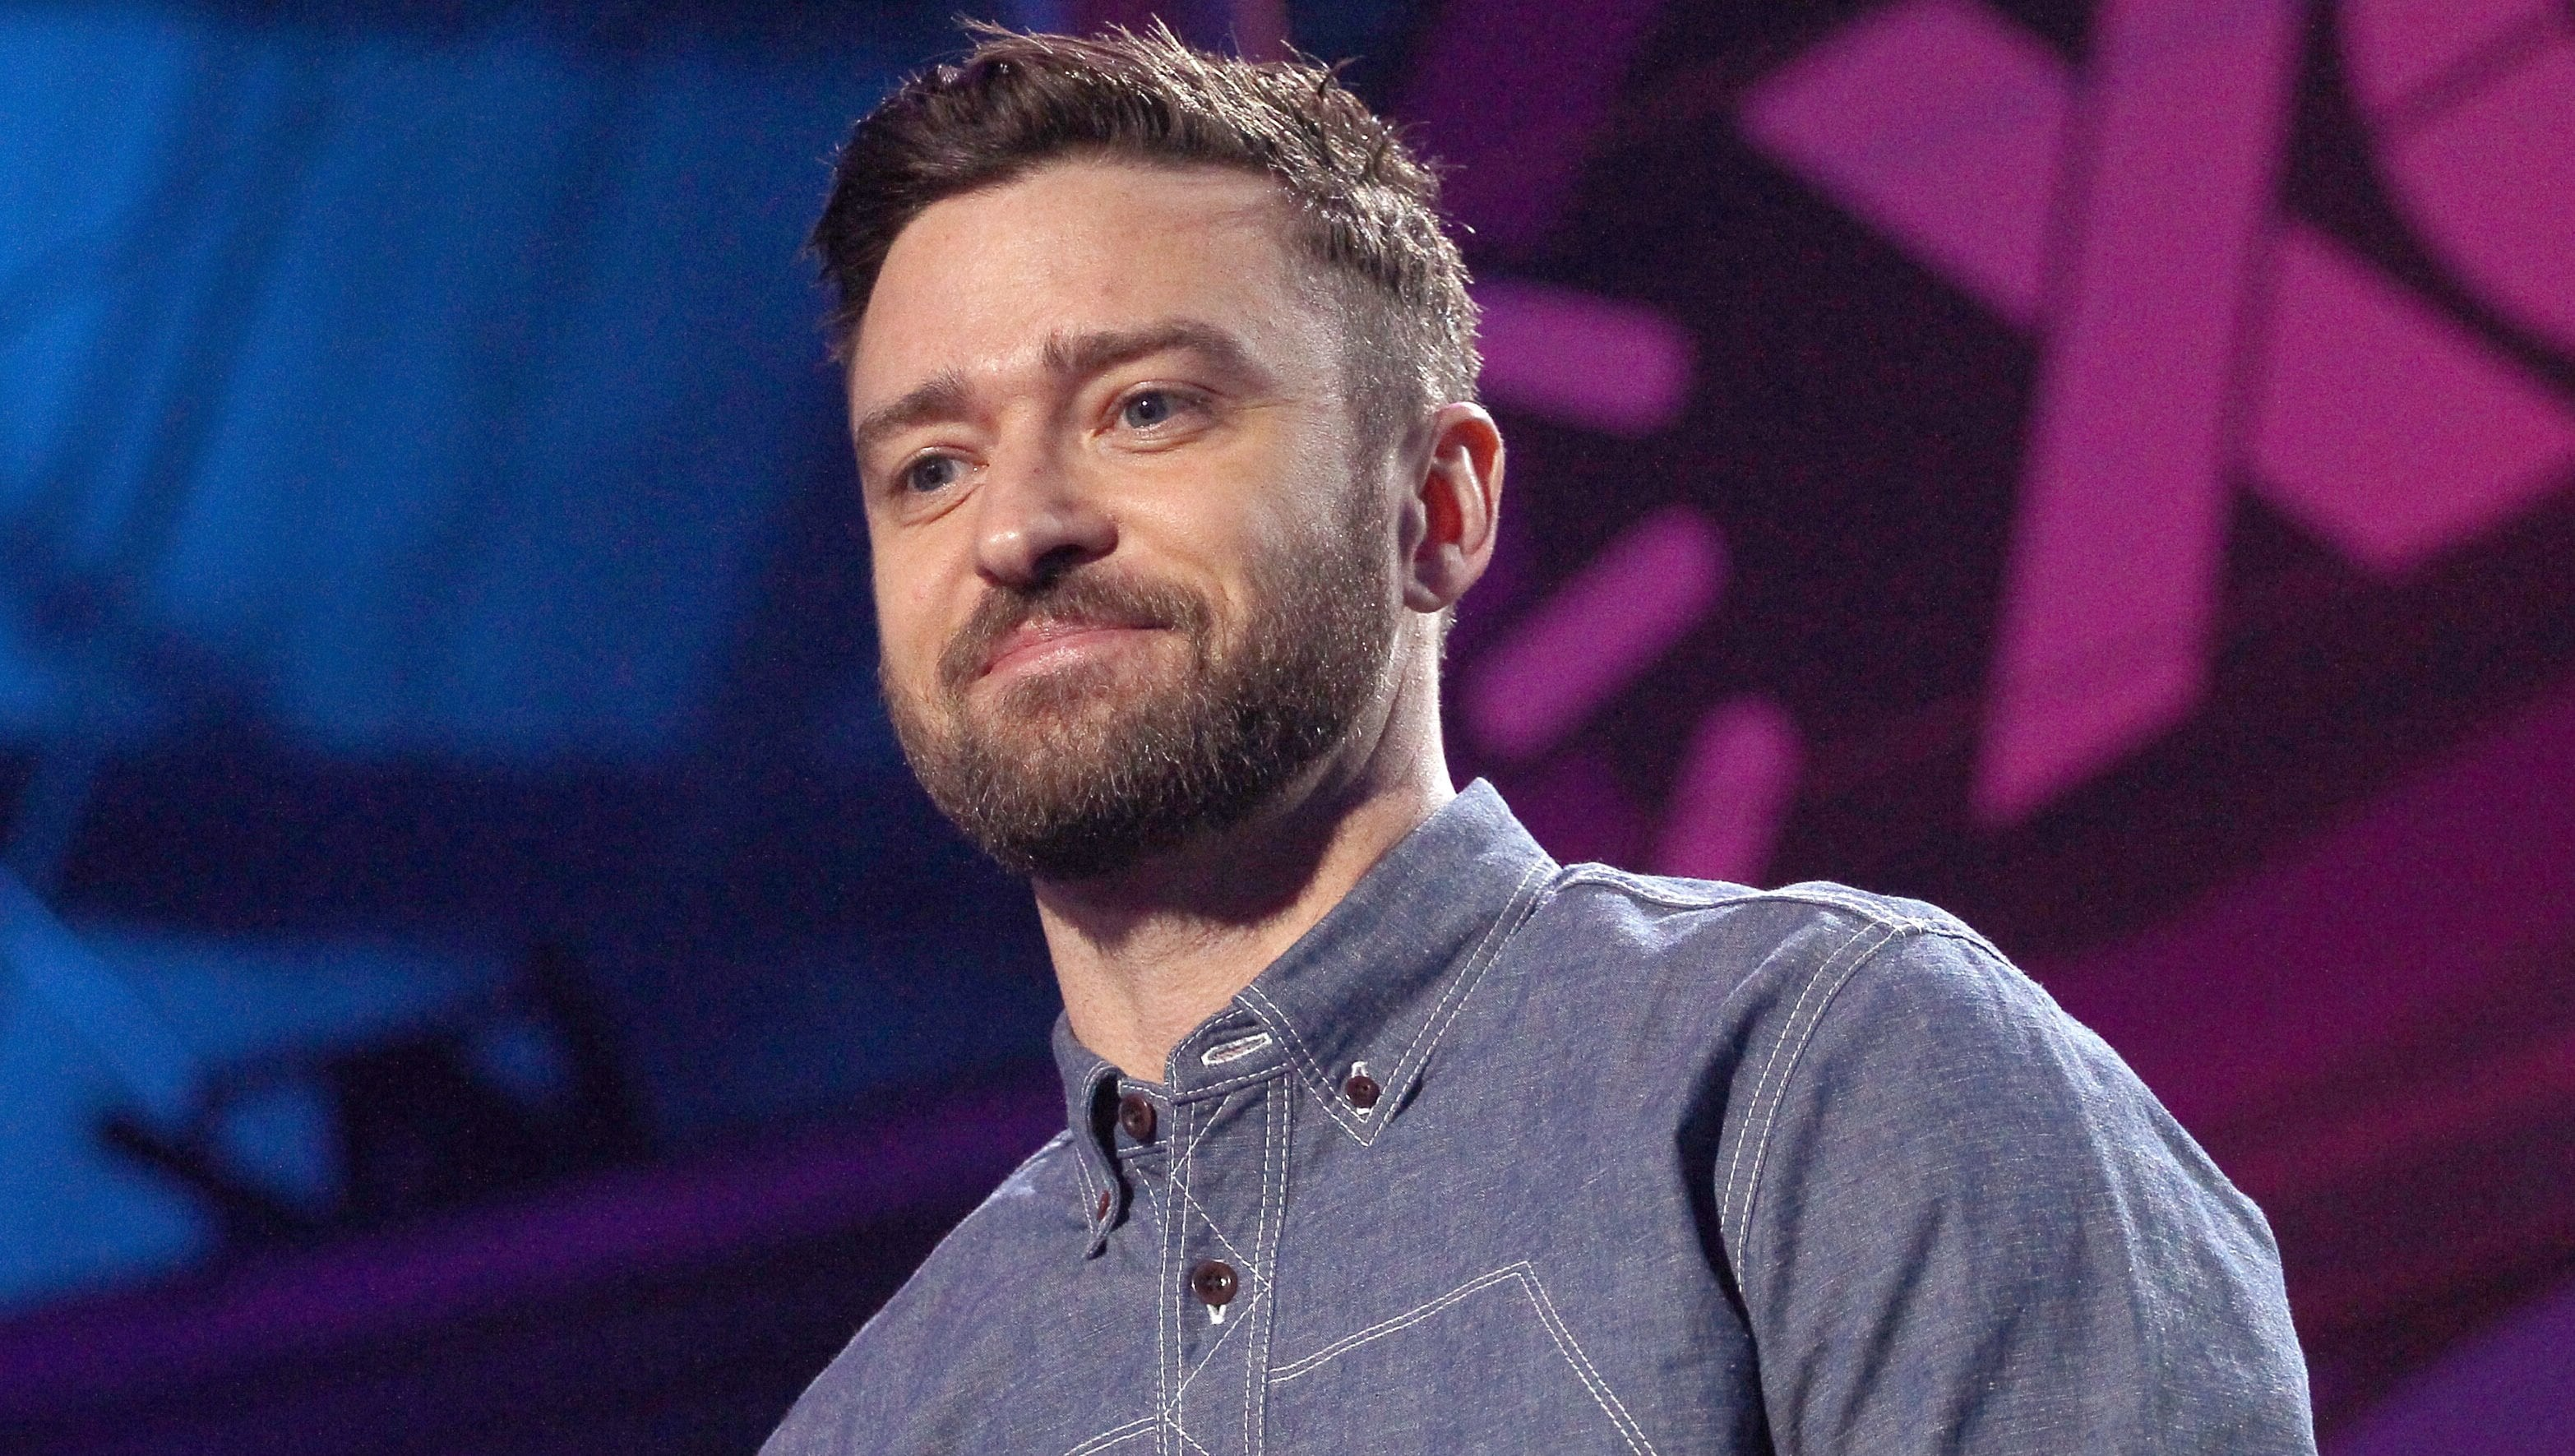 a1258506ffee66 Justin Timberlake theGrio.com. (Photo by Tommaso Boddi Getty Images)